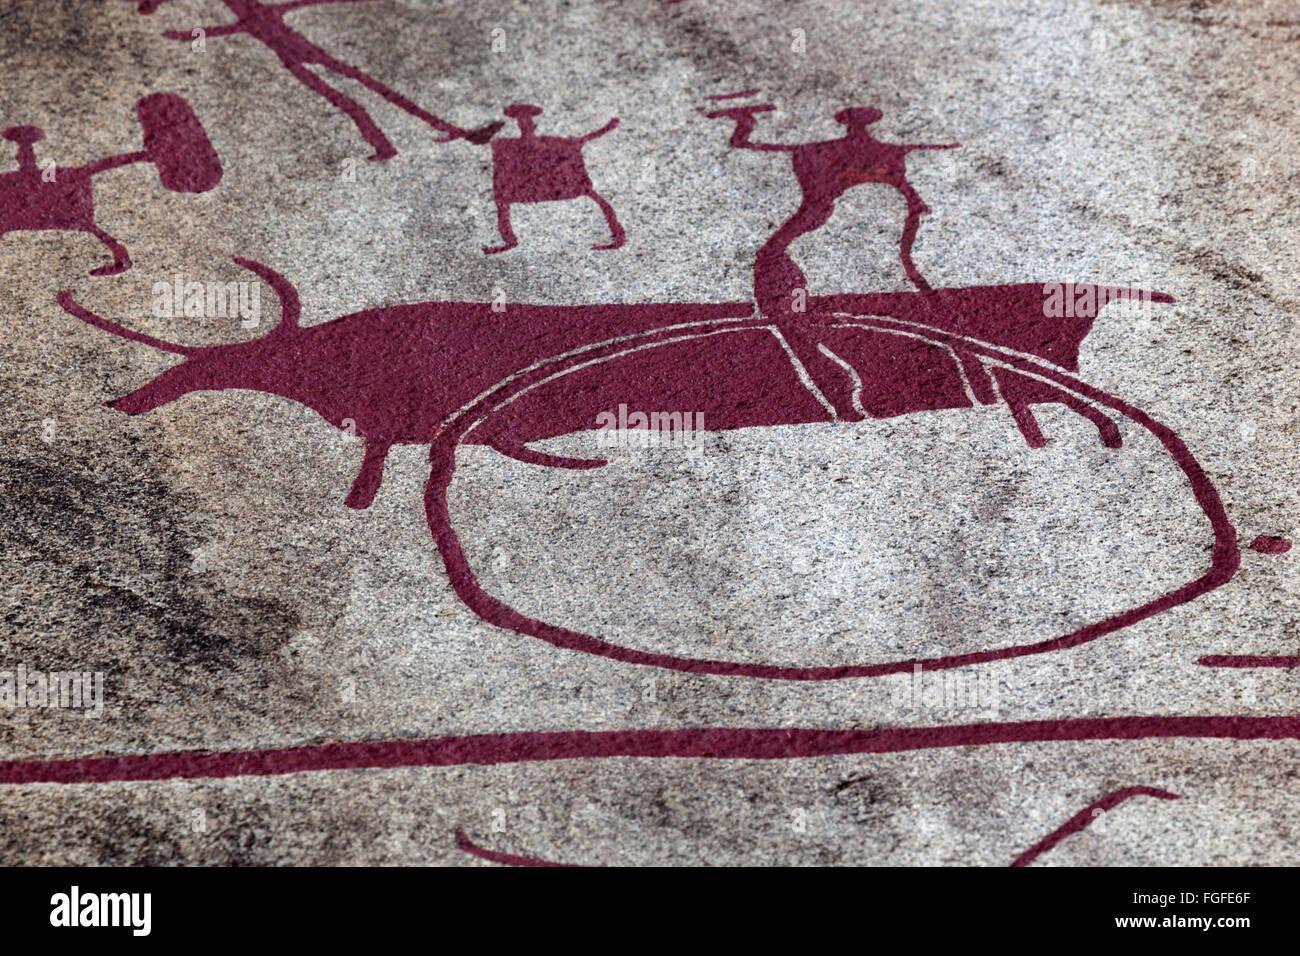 Vitlycke Rock Bronze Age rock carvings, Tanumshede, Bohuslän, Southwest Sweden, Sweden, Scandinavia, Europe - Stock Image